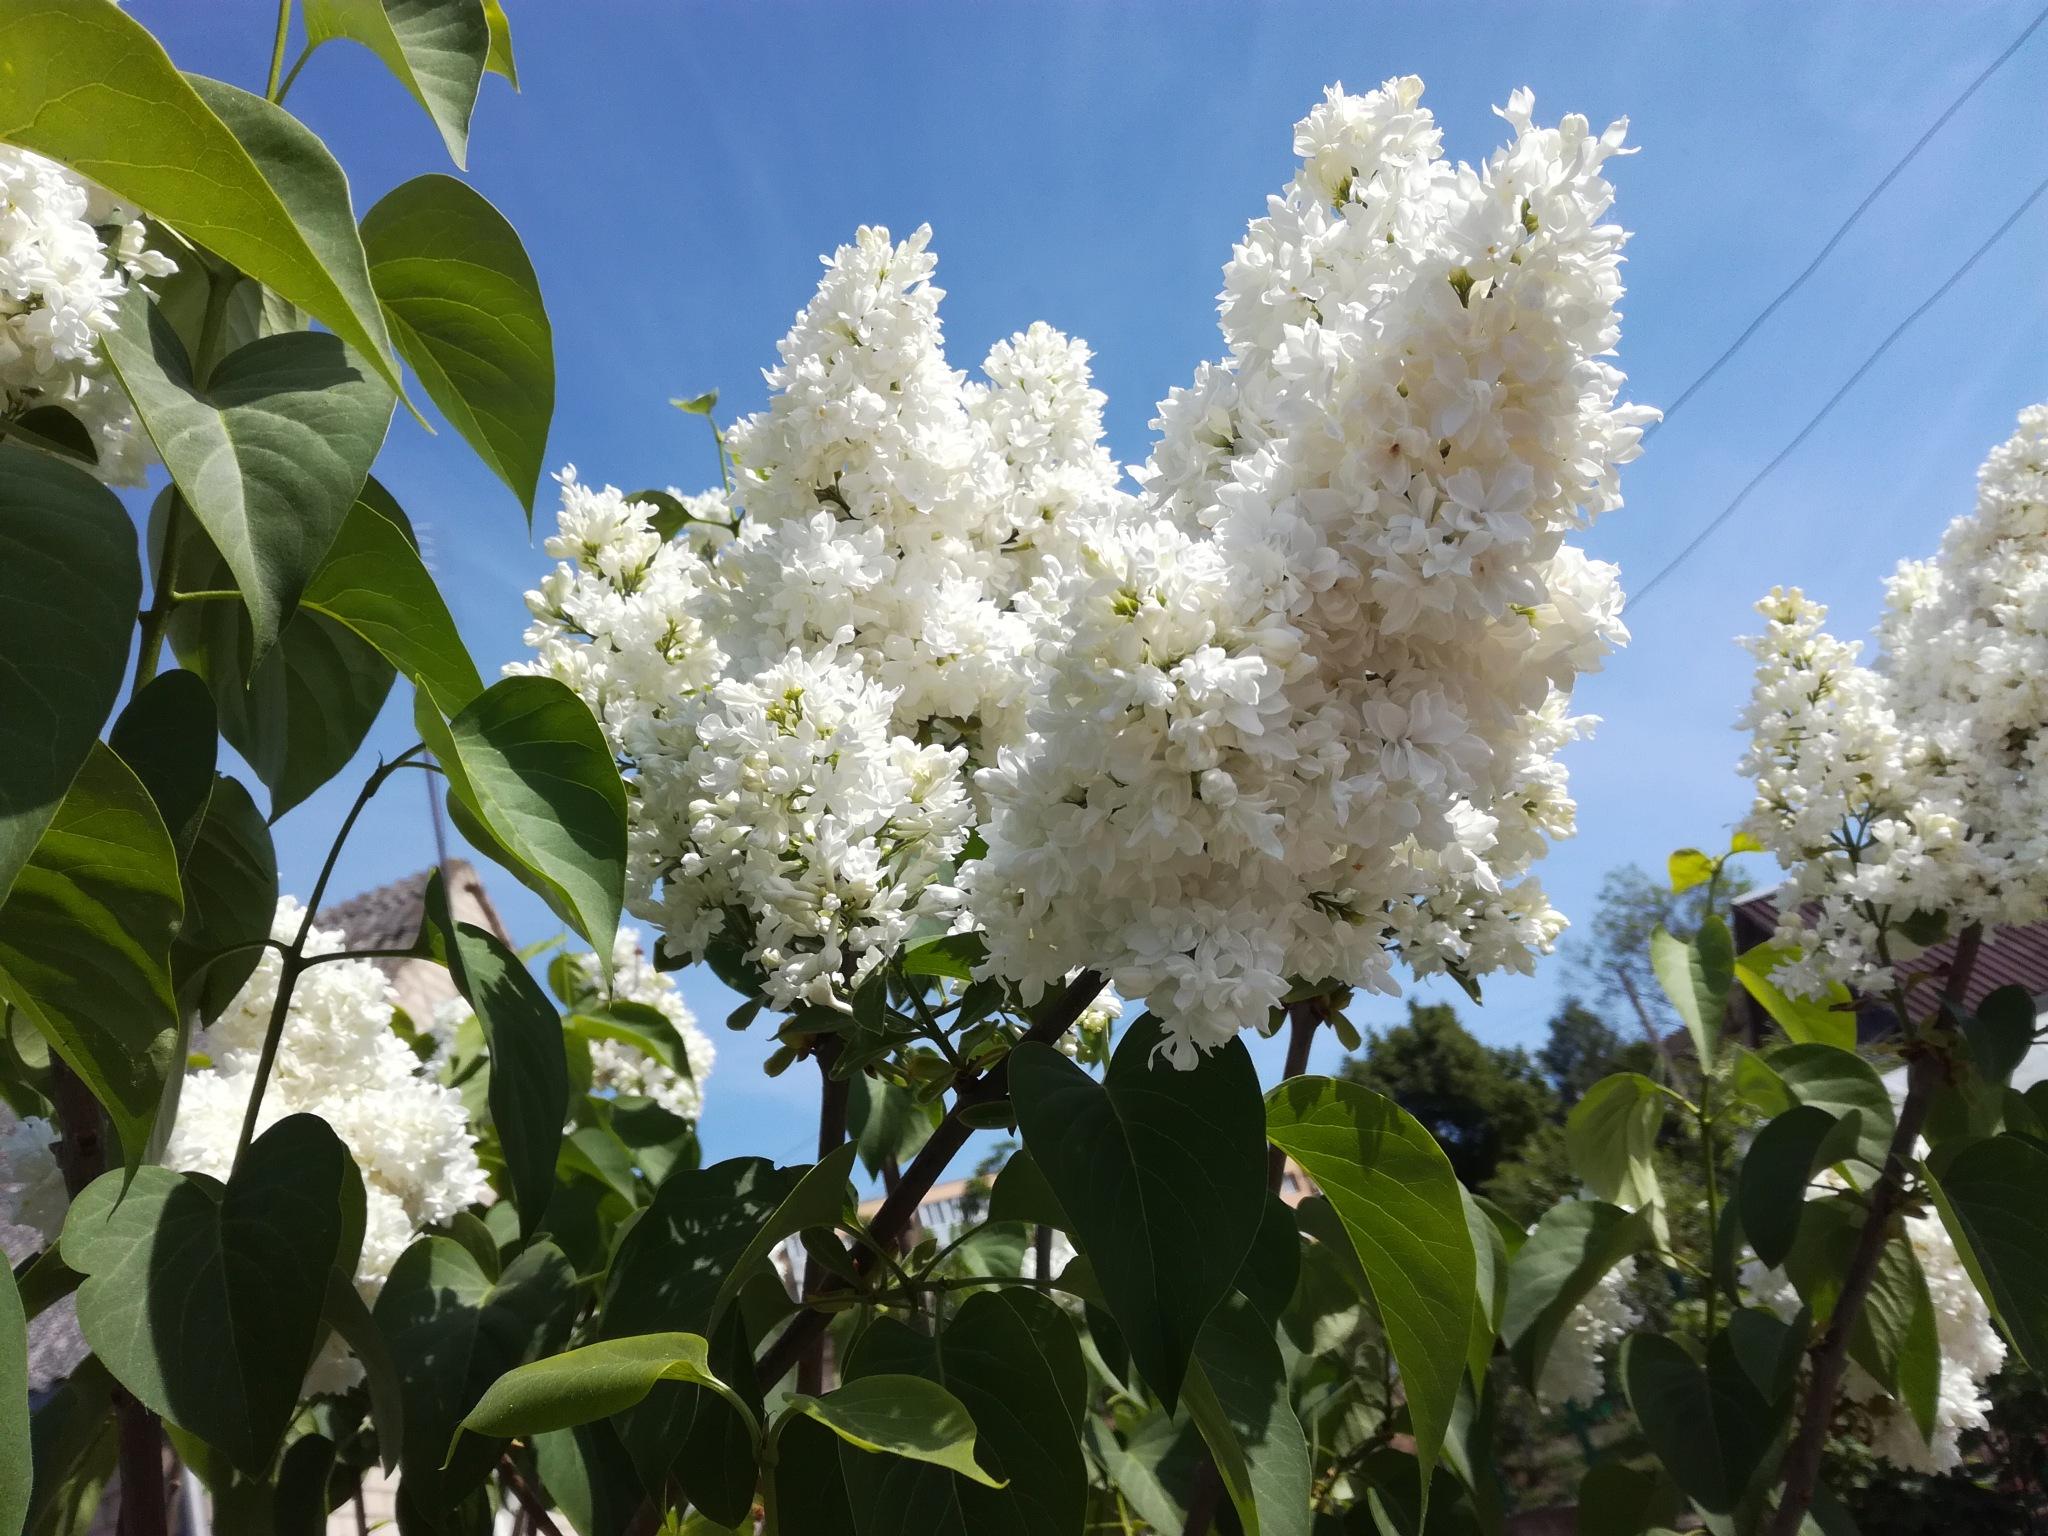 Spring flowering by uzkuraitiene62